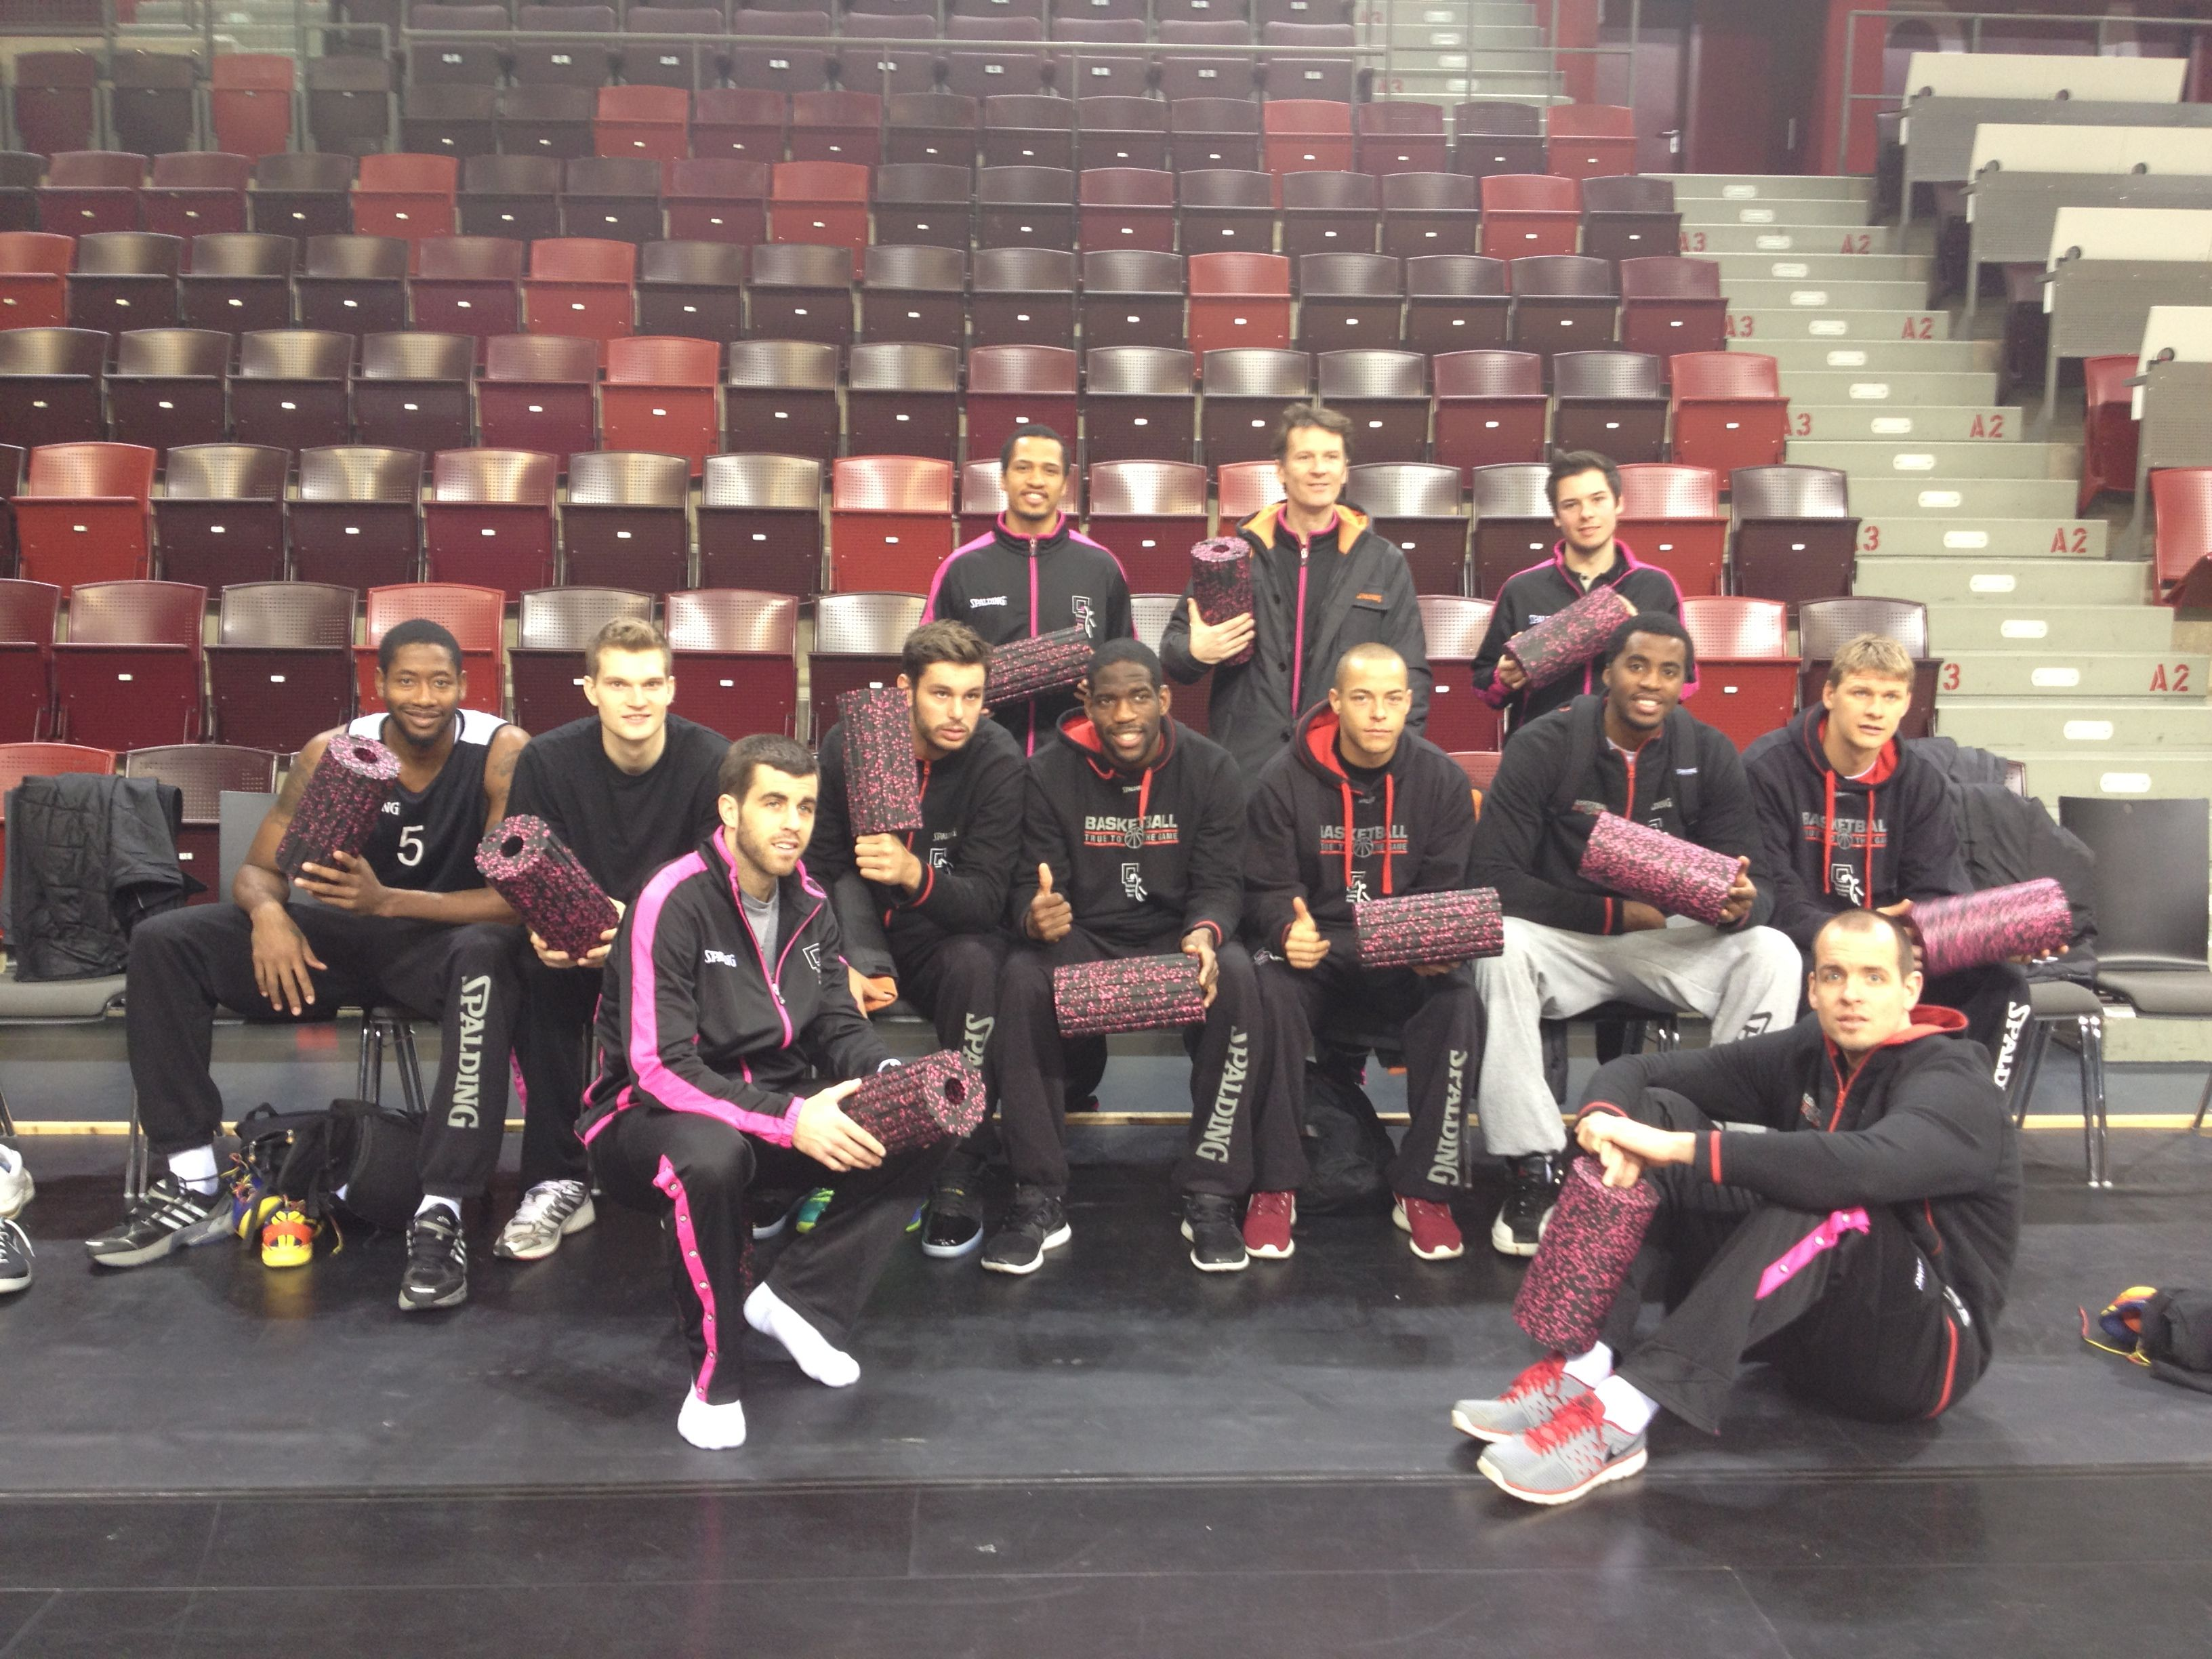 Telekom Baskets Bonn with BLACKROLL special edition in